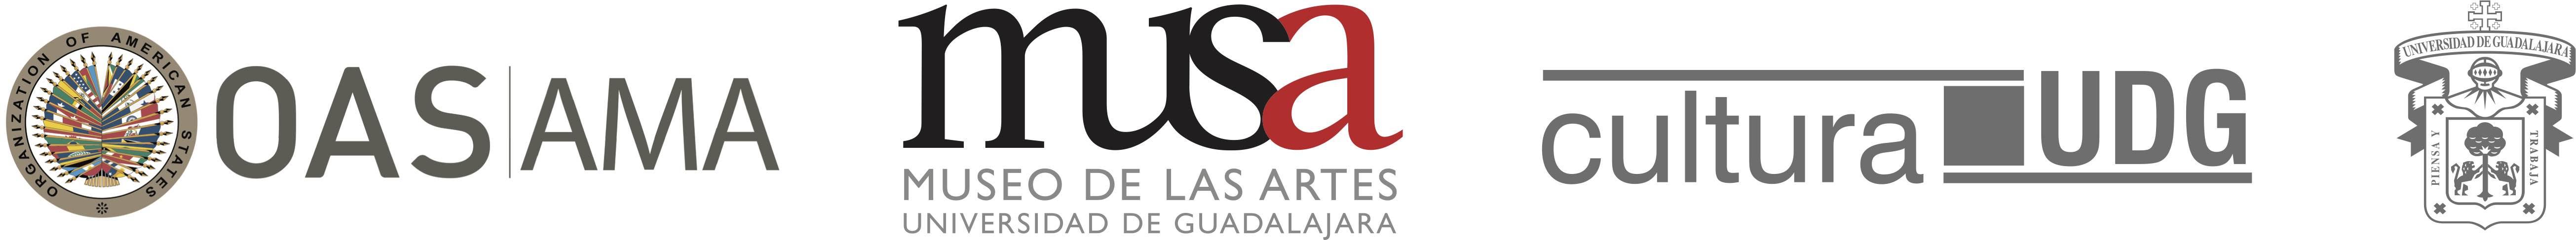 Sponsor Logos